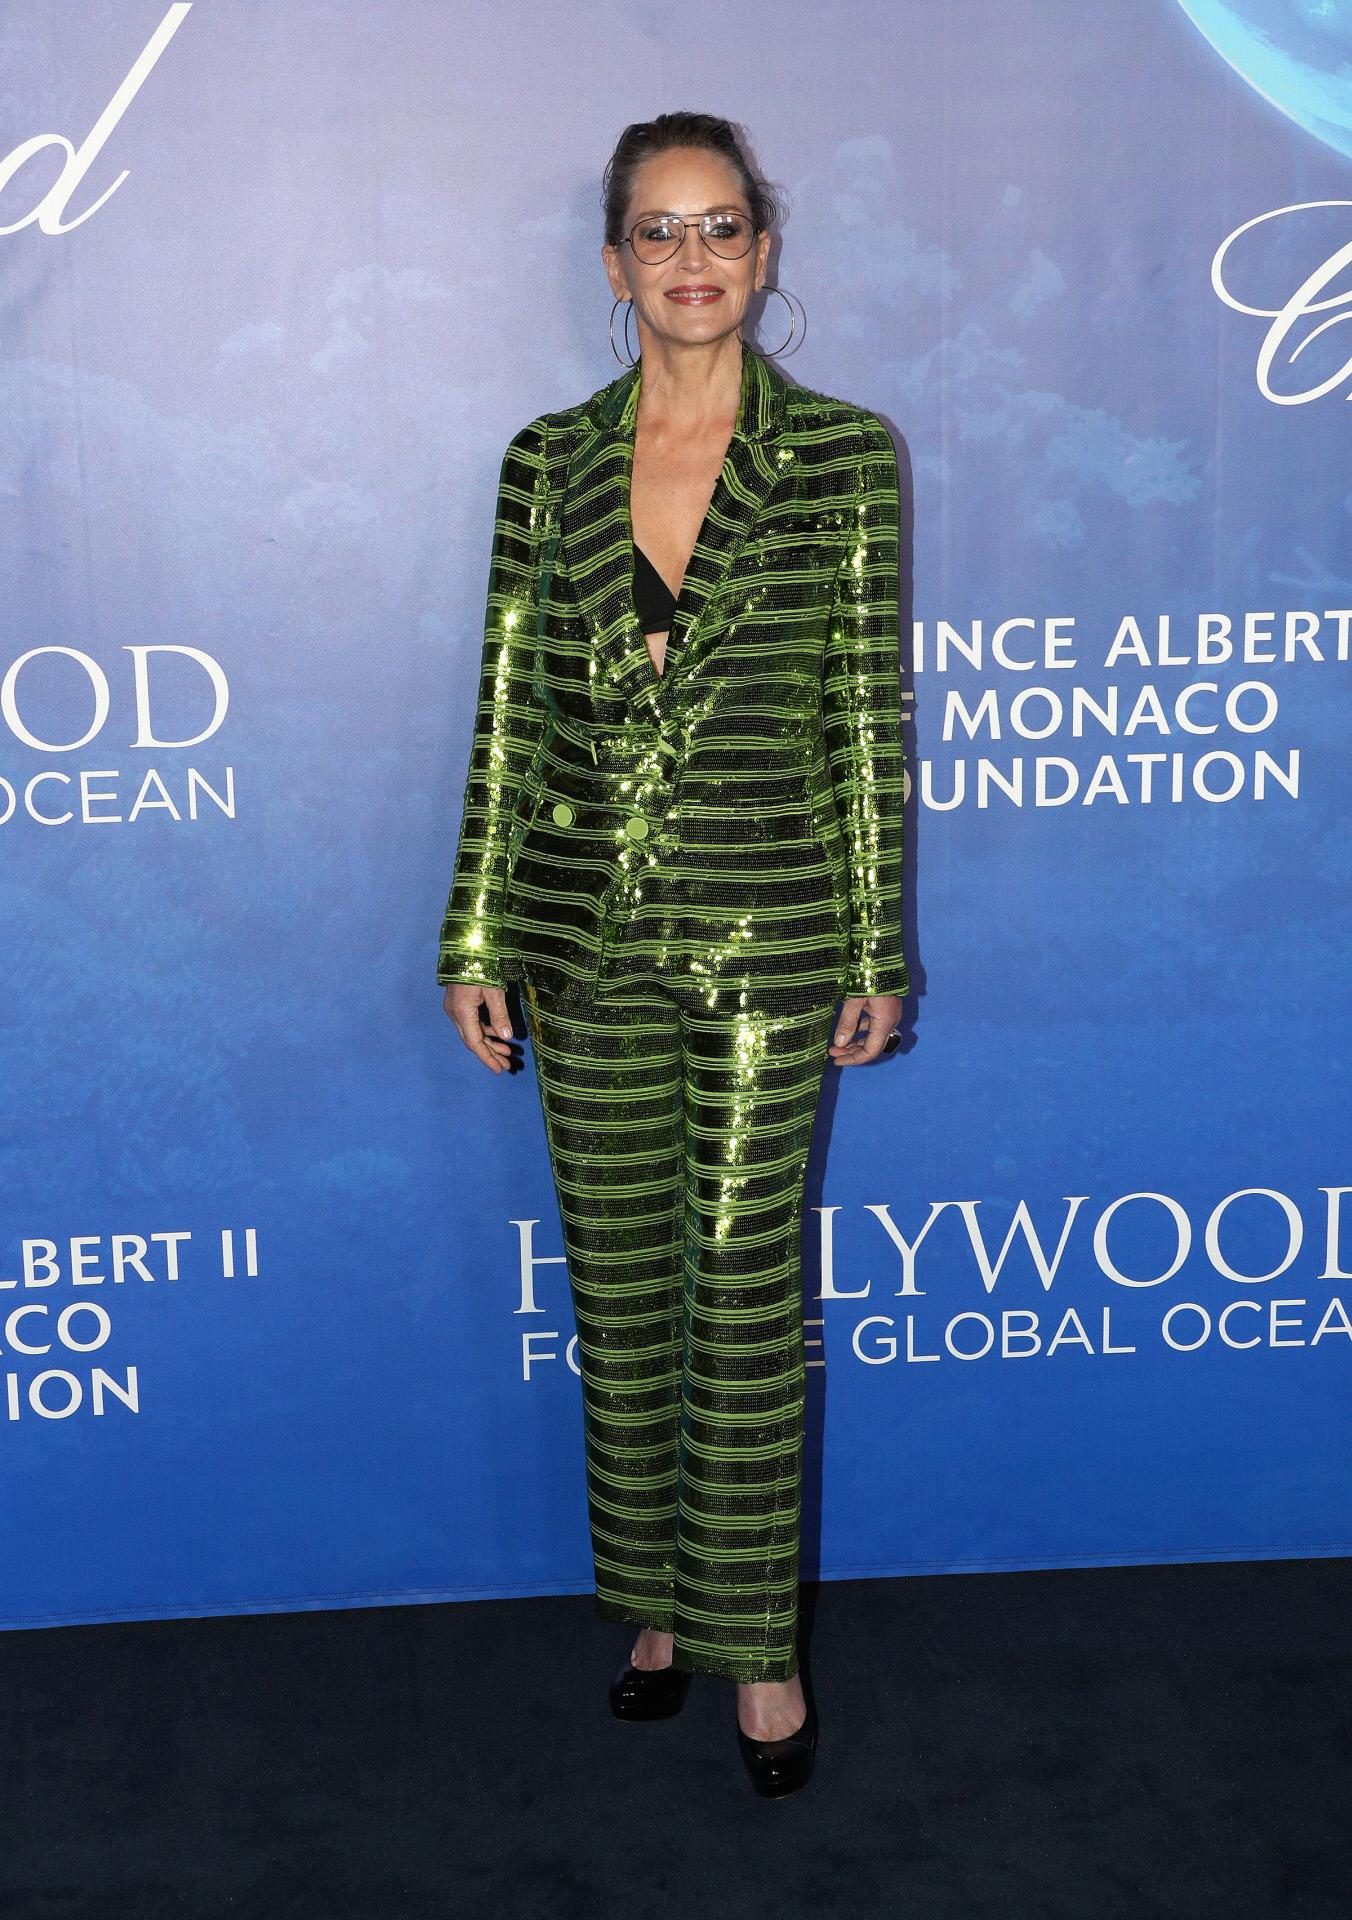 Sharon Stone con traje de Pertegaz en la Global Ocean Gala.